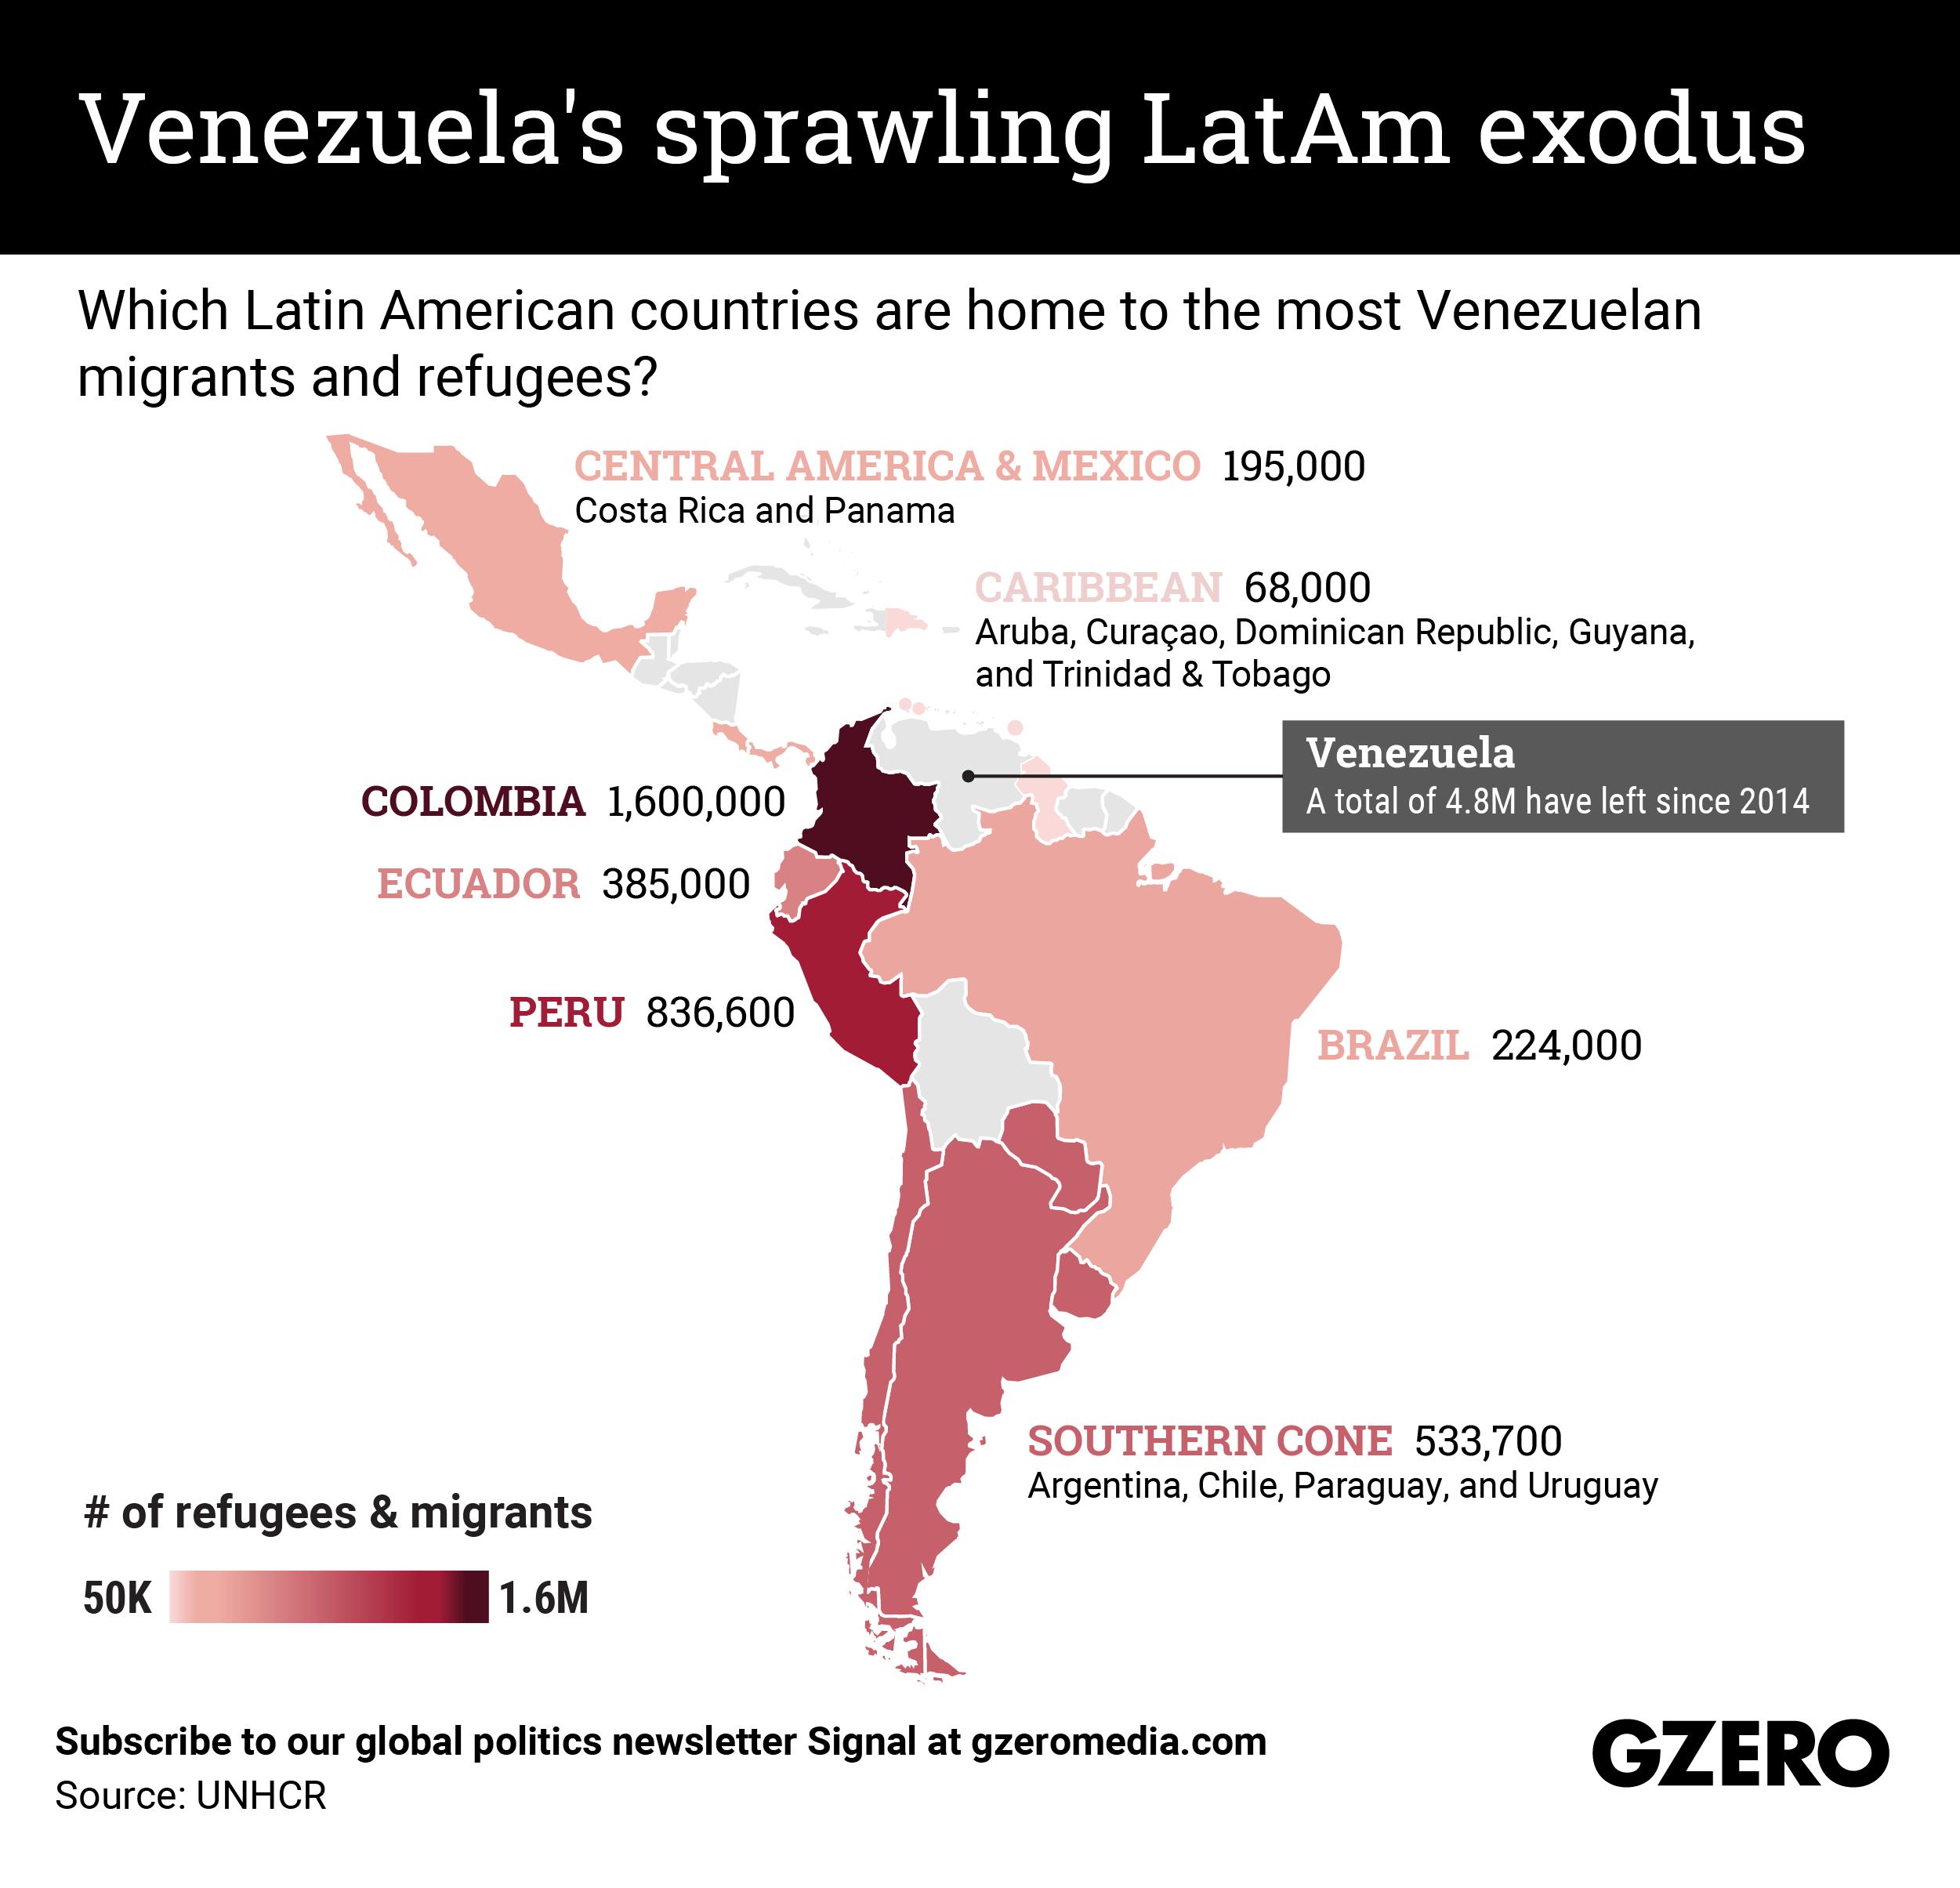 The Graphic Truth: Venezuela's sprawling LatAm exodus